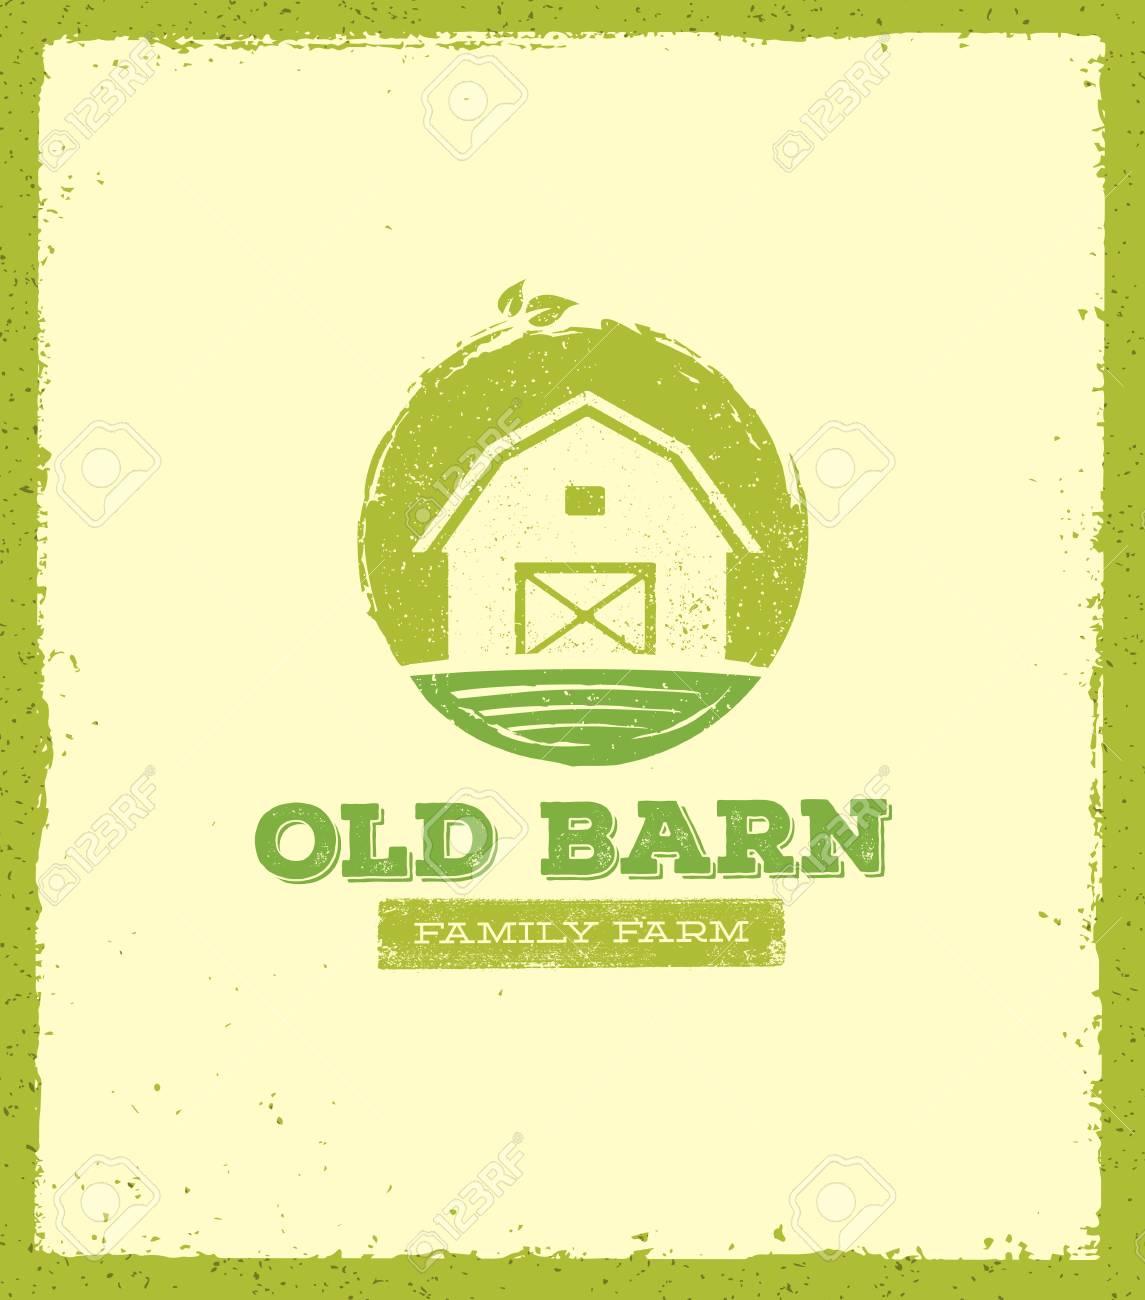 Old Barn Local Farm Creative Sign Concept. Organic Food Fresh Healthy Eco Green Vector Banner Concept - 72166276